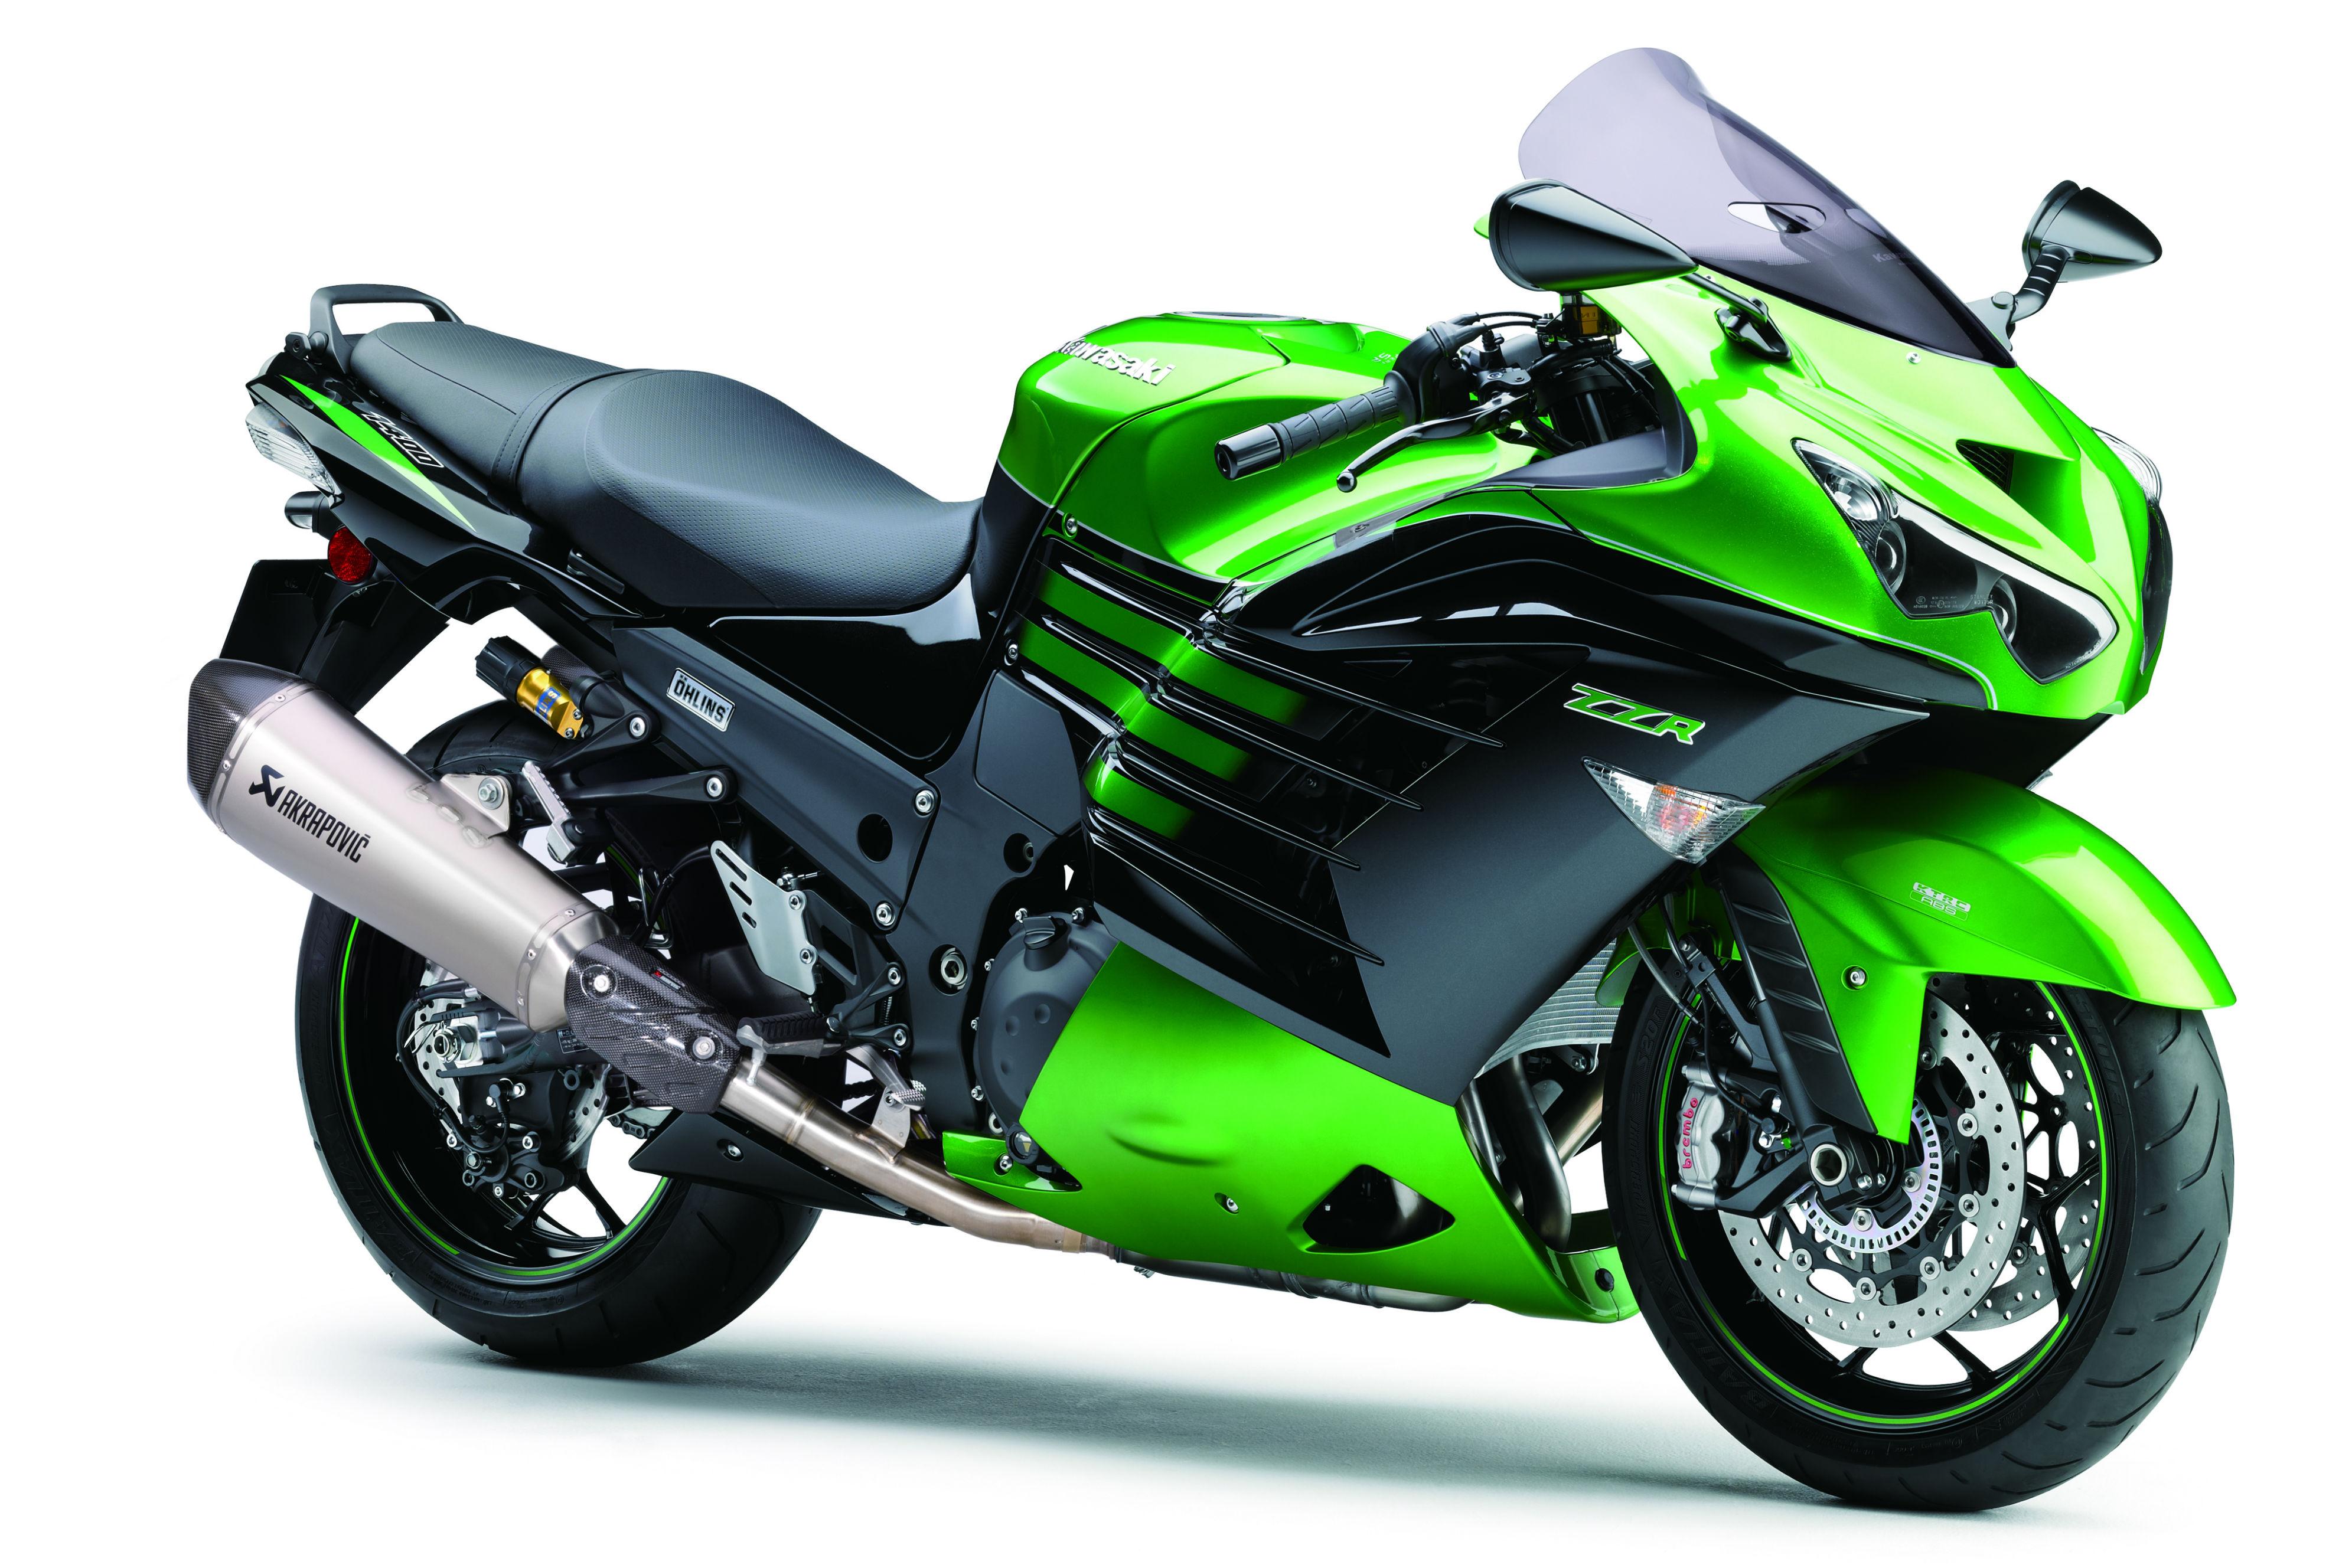 2016 Kawasaki ZZR1400 revealed | Visordown